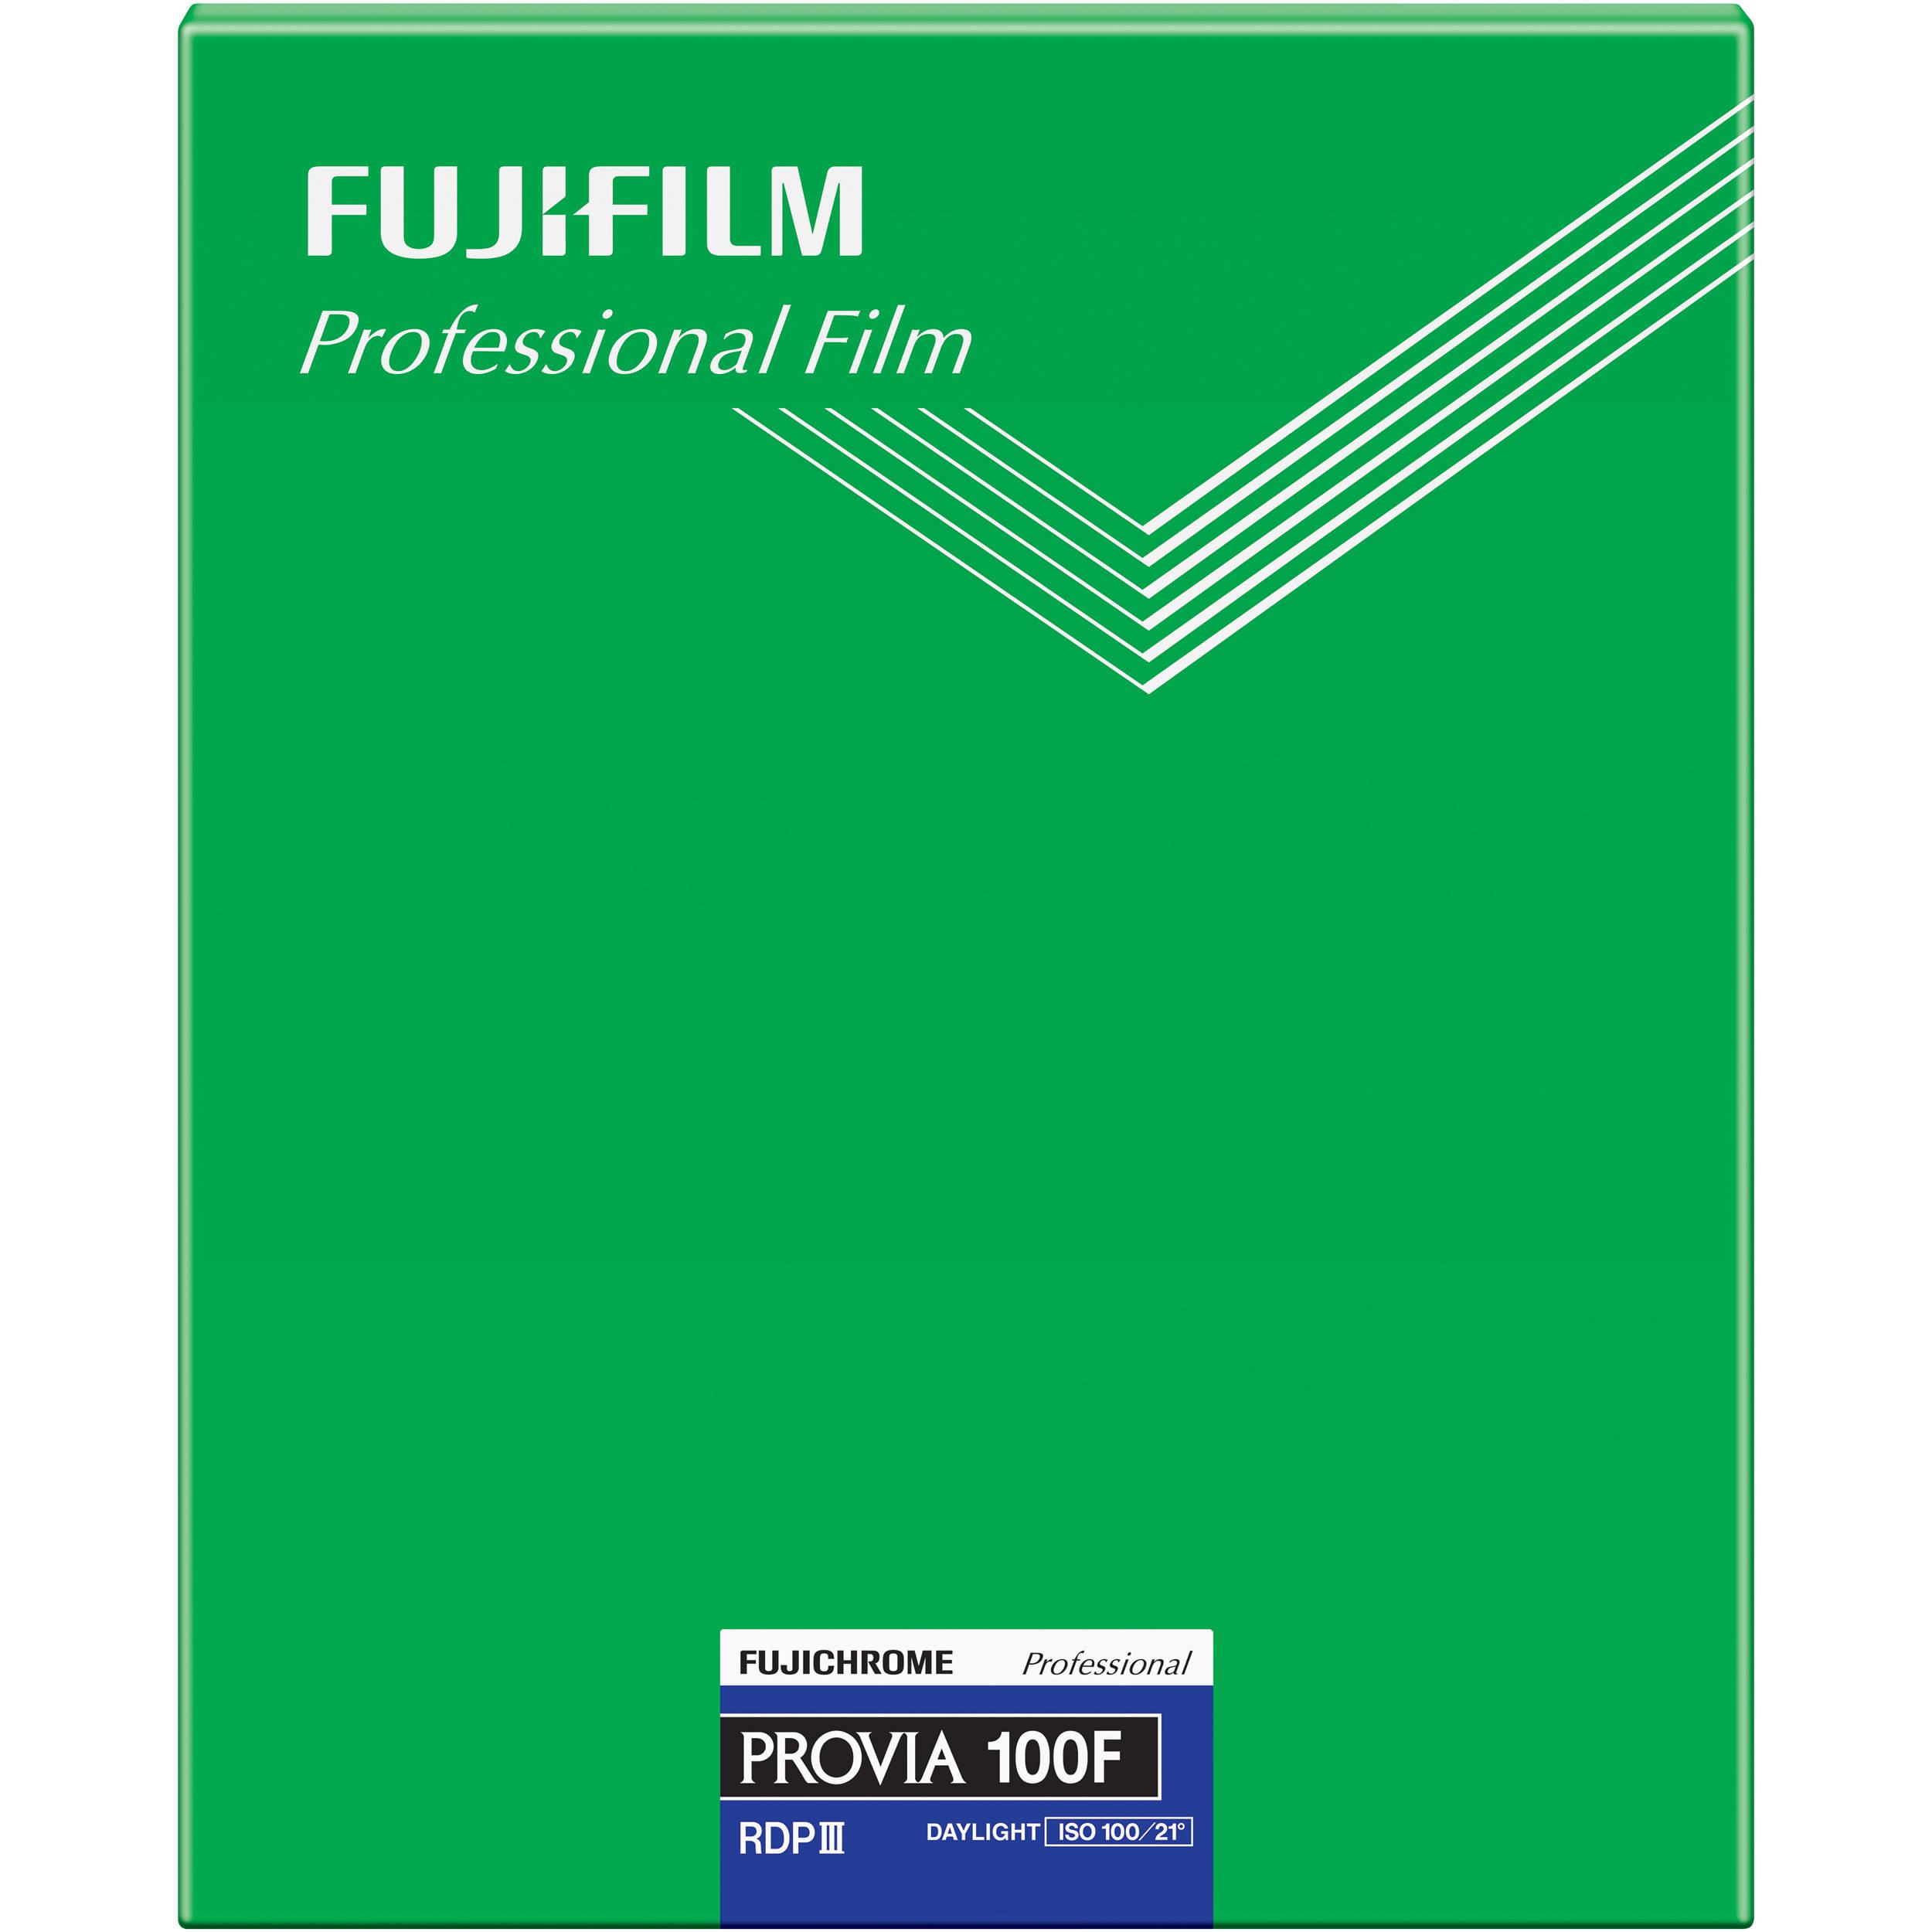 Fujifilm fujichrome provia 100f professional rdp iii 16326145 for What is provia